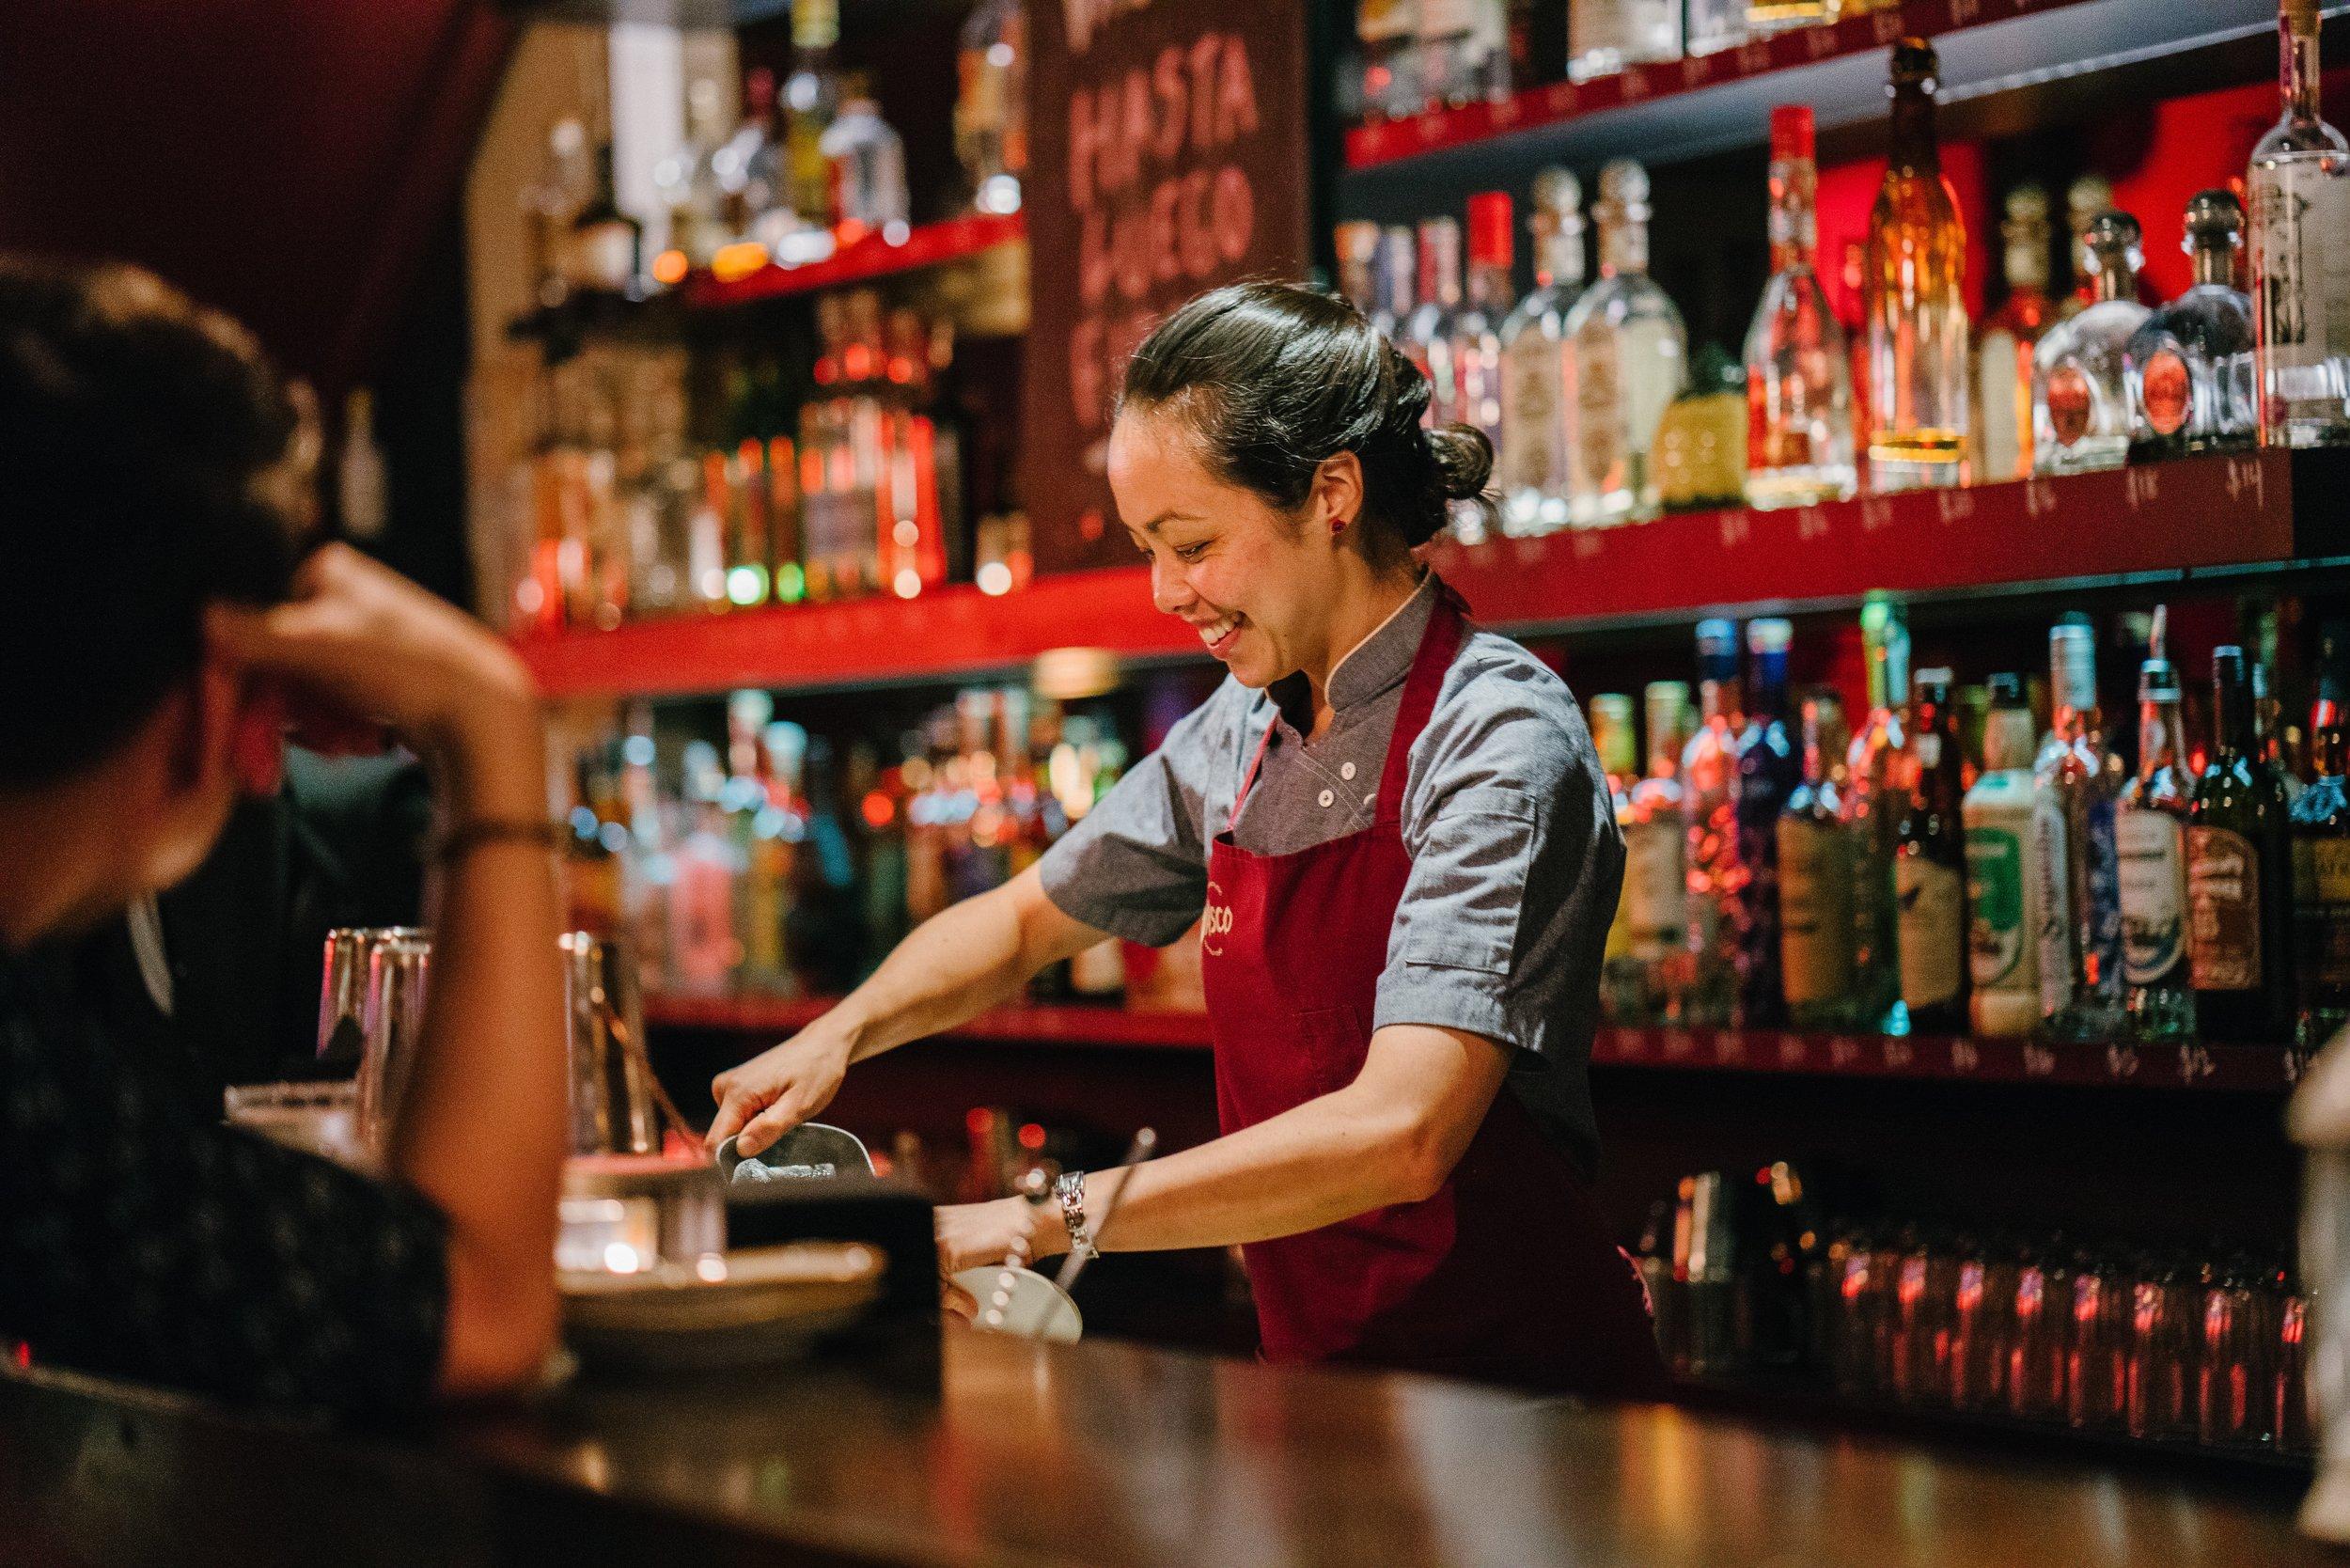 alcohol-apron-bar-1301547.jpg